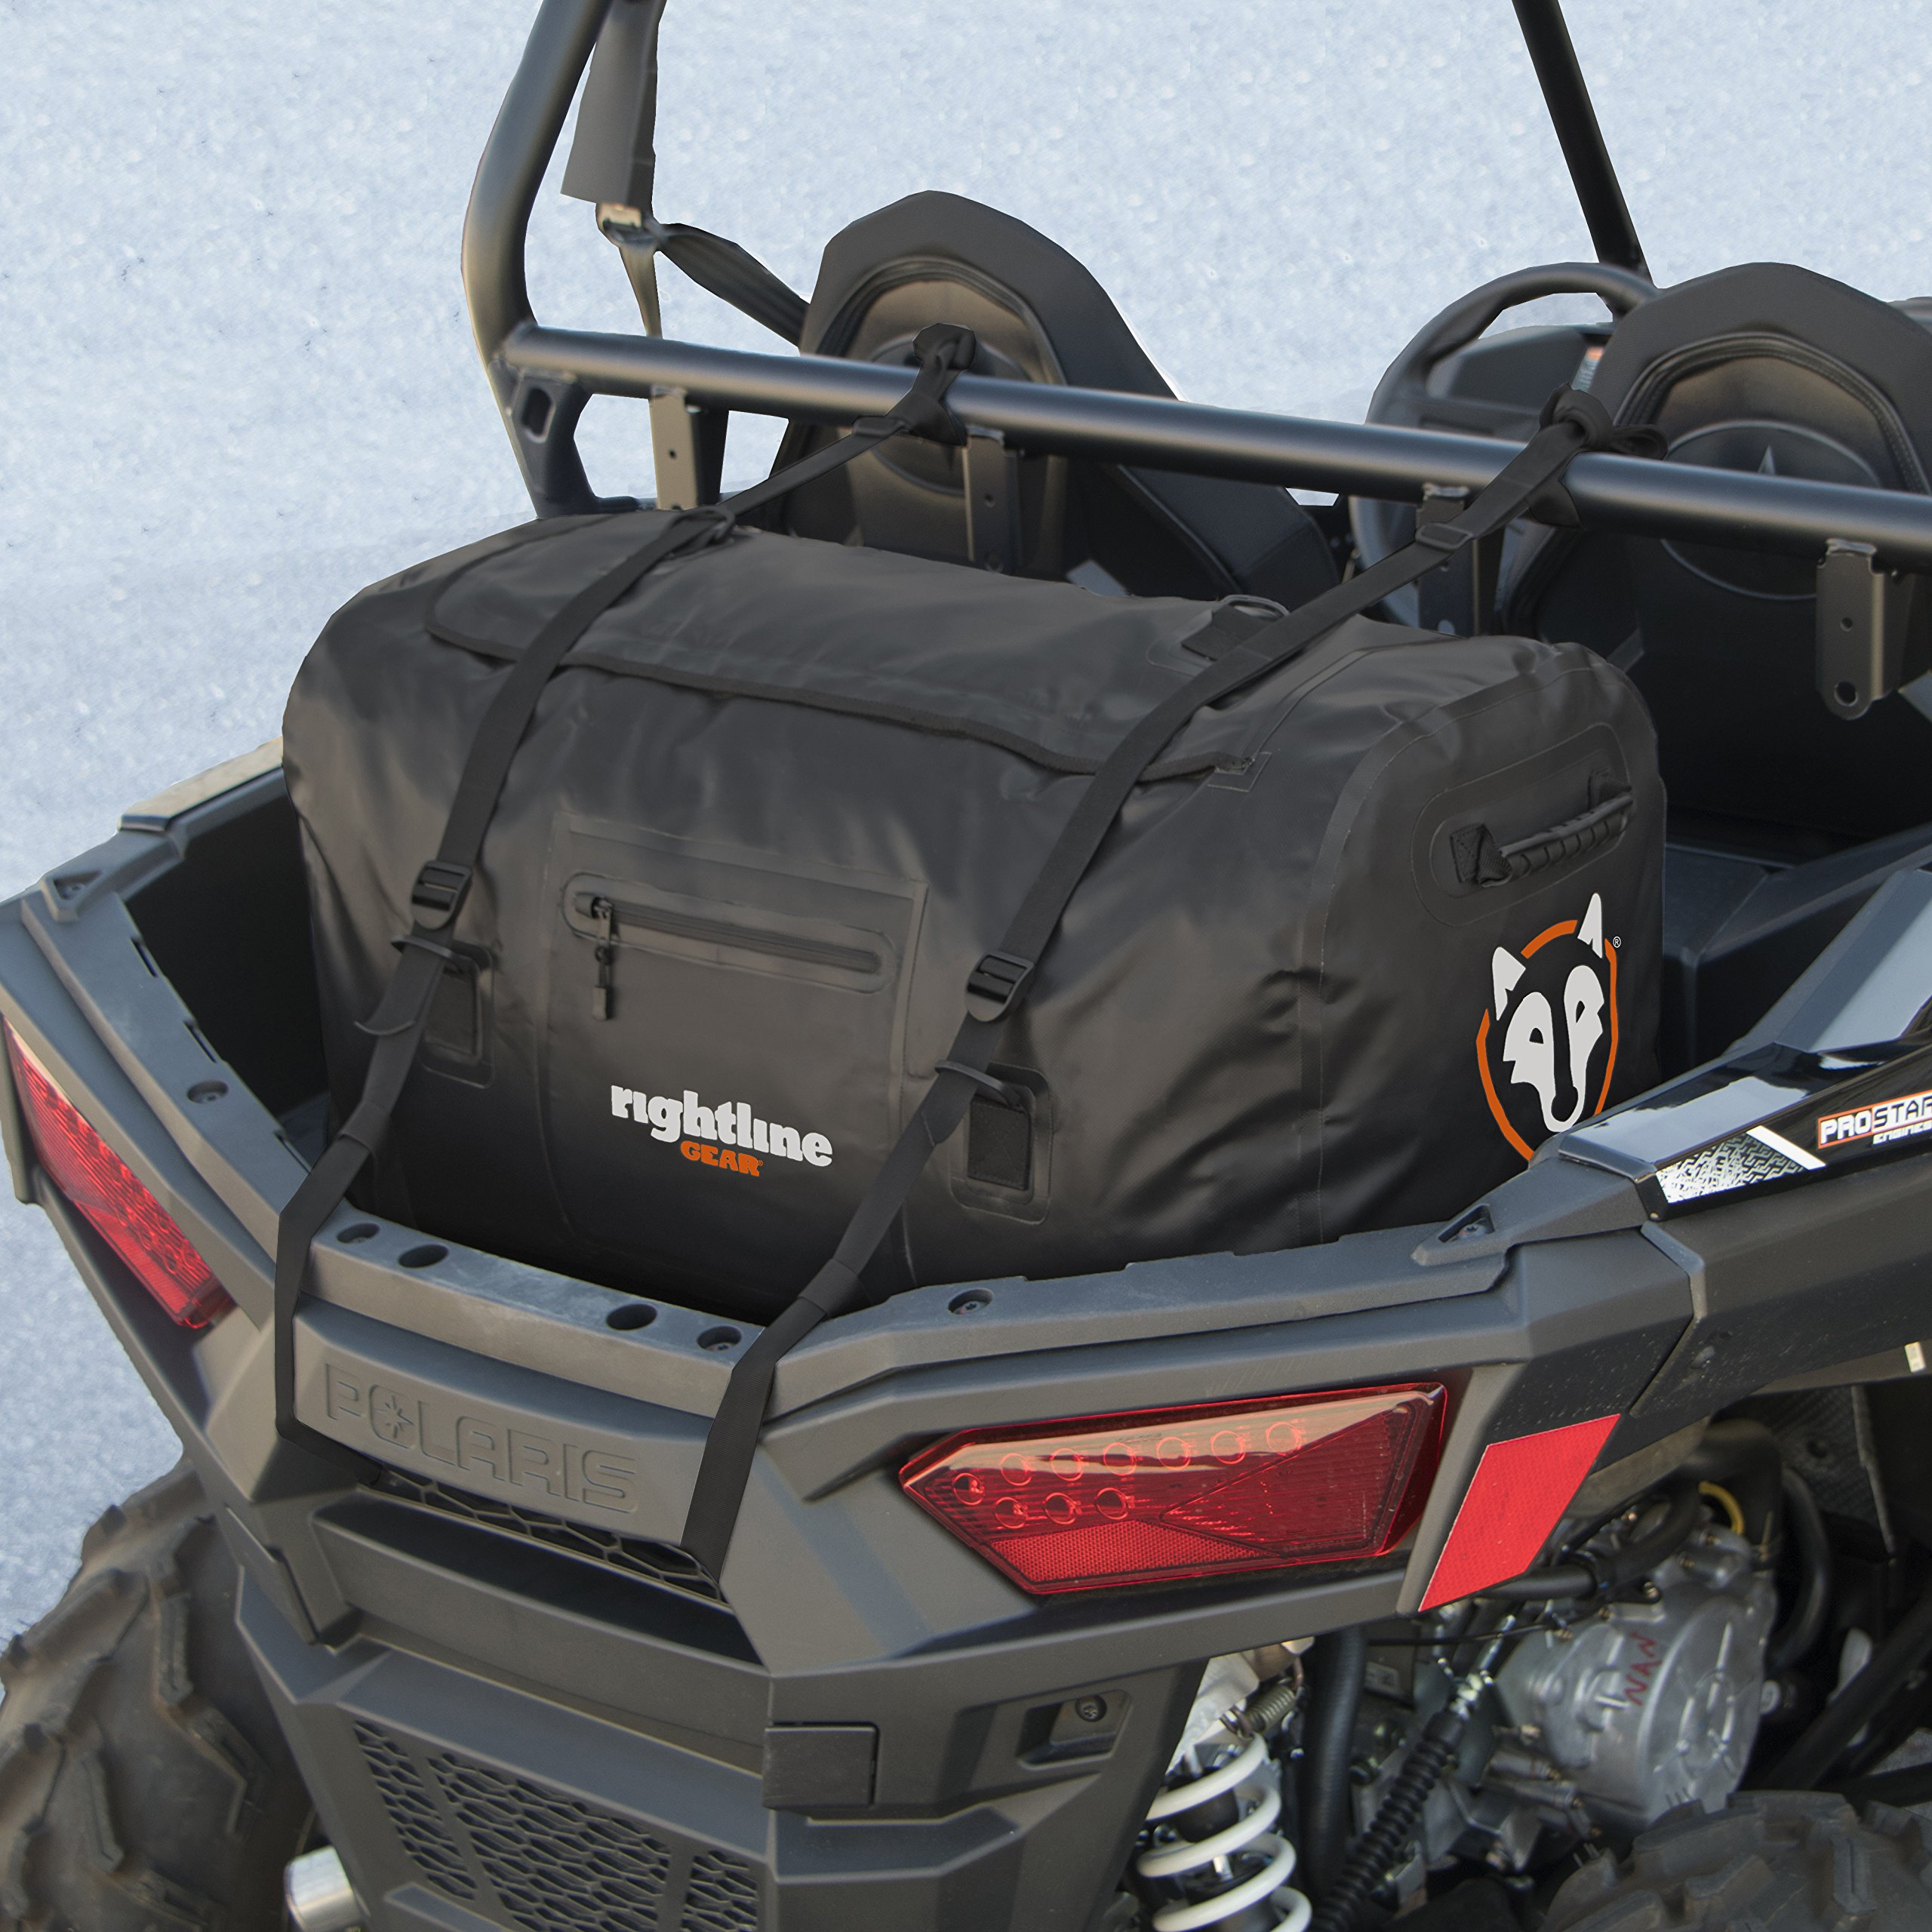 Rightline Gear 100J87-B 4x4 Duffle Bag (120L) by Rightline Gear (Image #4)